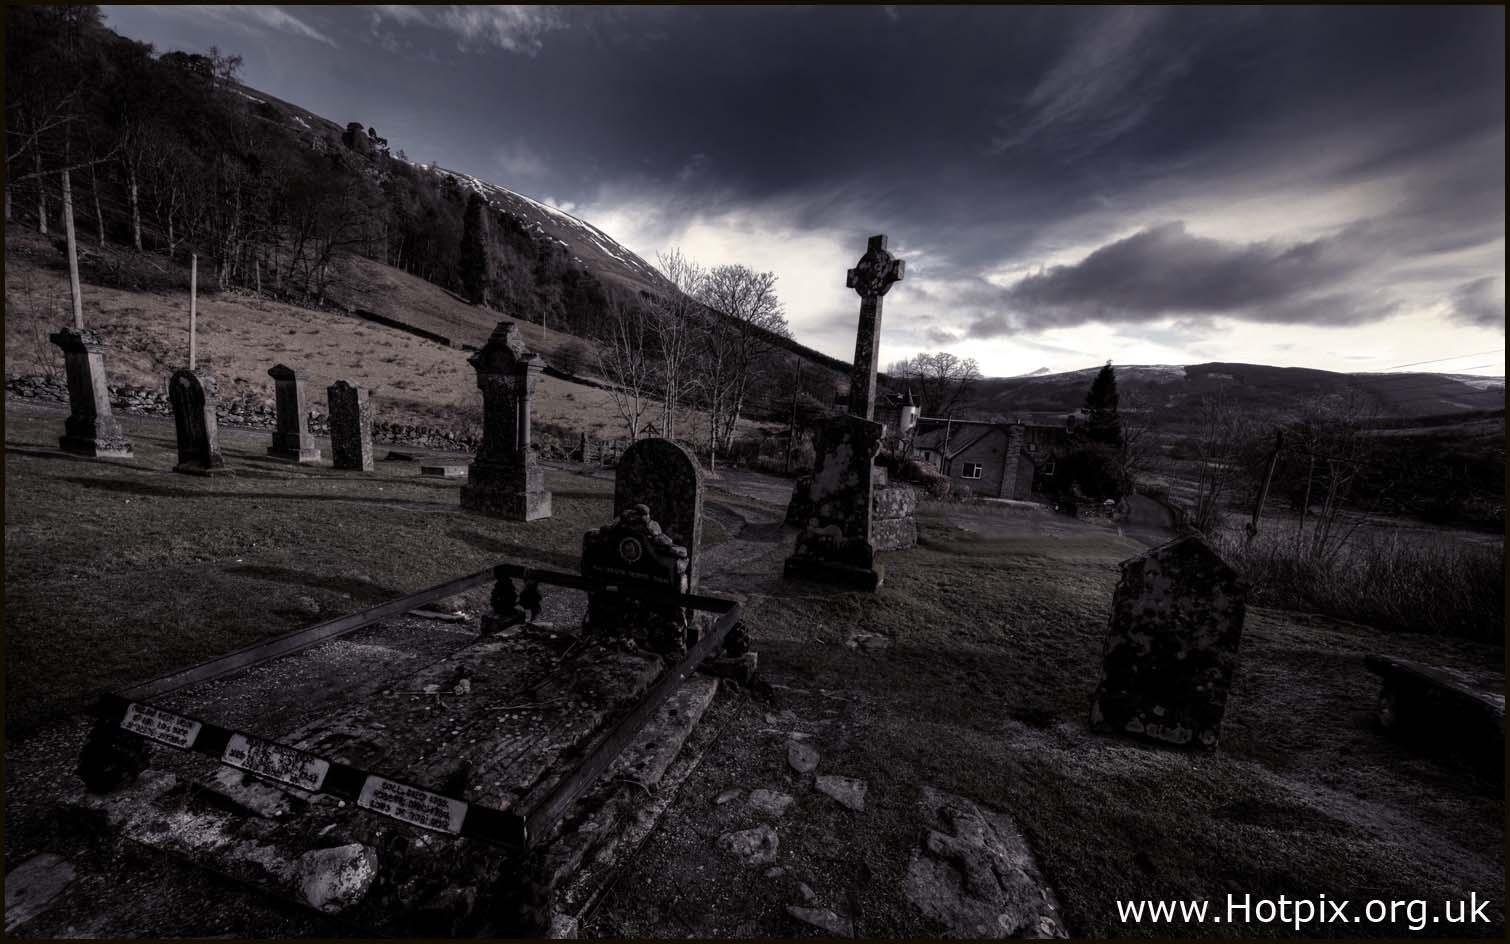 rob,roy,macgregor,macgreger,mcgregor,brave,heart,braveheart,scotland,grave,balquidder,balquider,kirk,church,yard,kirkyard,heritage,b/w,black,white,selective,color,coloured,mono,monochrome,dramatic,tourist,where,visit,hdr,dark,disturbia,hotpics,hotpic,hotpick,hotpicks,graves,tomb,tombs,cemetario,cemetary,cemetery,interesting,place,places,building,buildings,built,architecture,selectivo,couleur,s\u00e9lective,vorgew\u00e4hlte,Farbe,art,arty,sex,sexy,wide,angle,wideangle,lens,sigma,12-24mm,10-20mm,edinbrugh,hotpix!